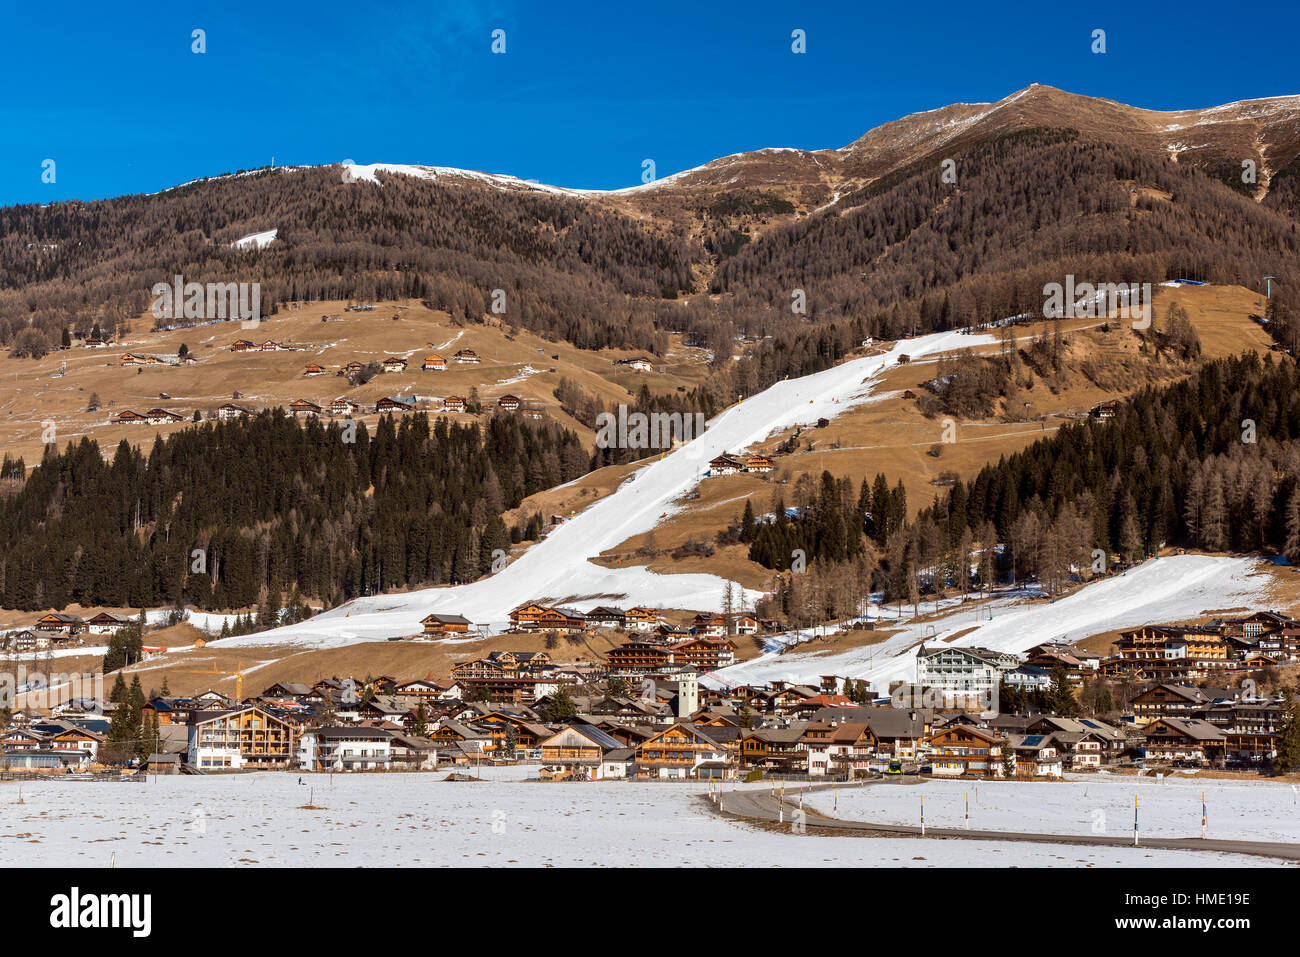 Dry ski stock photos images alamy